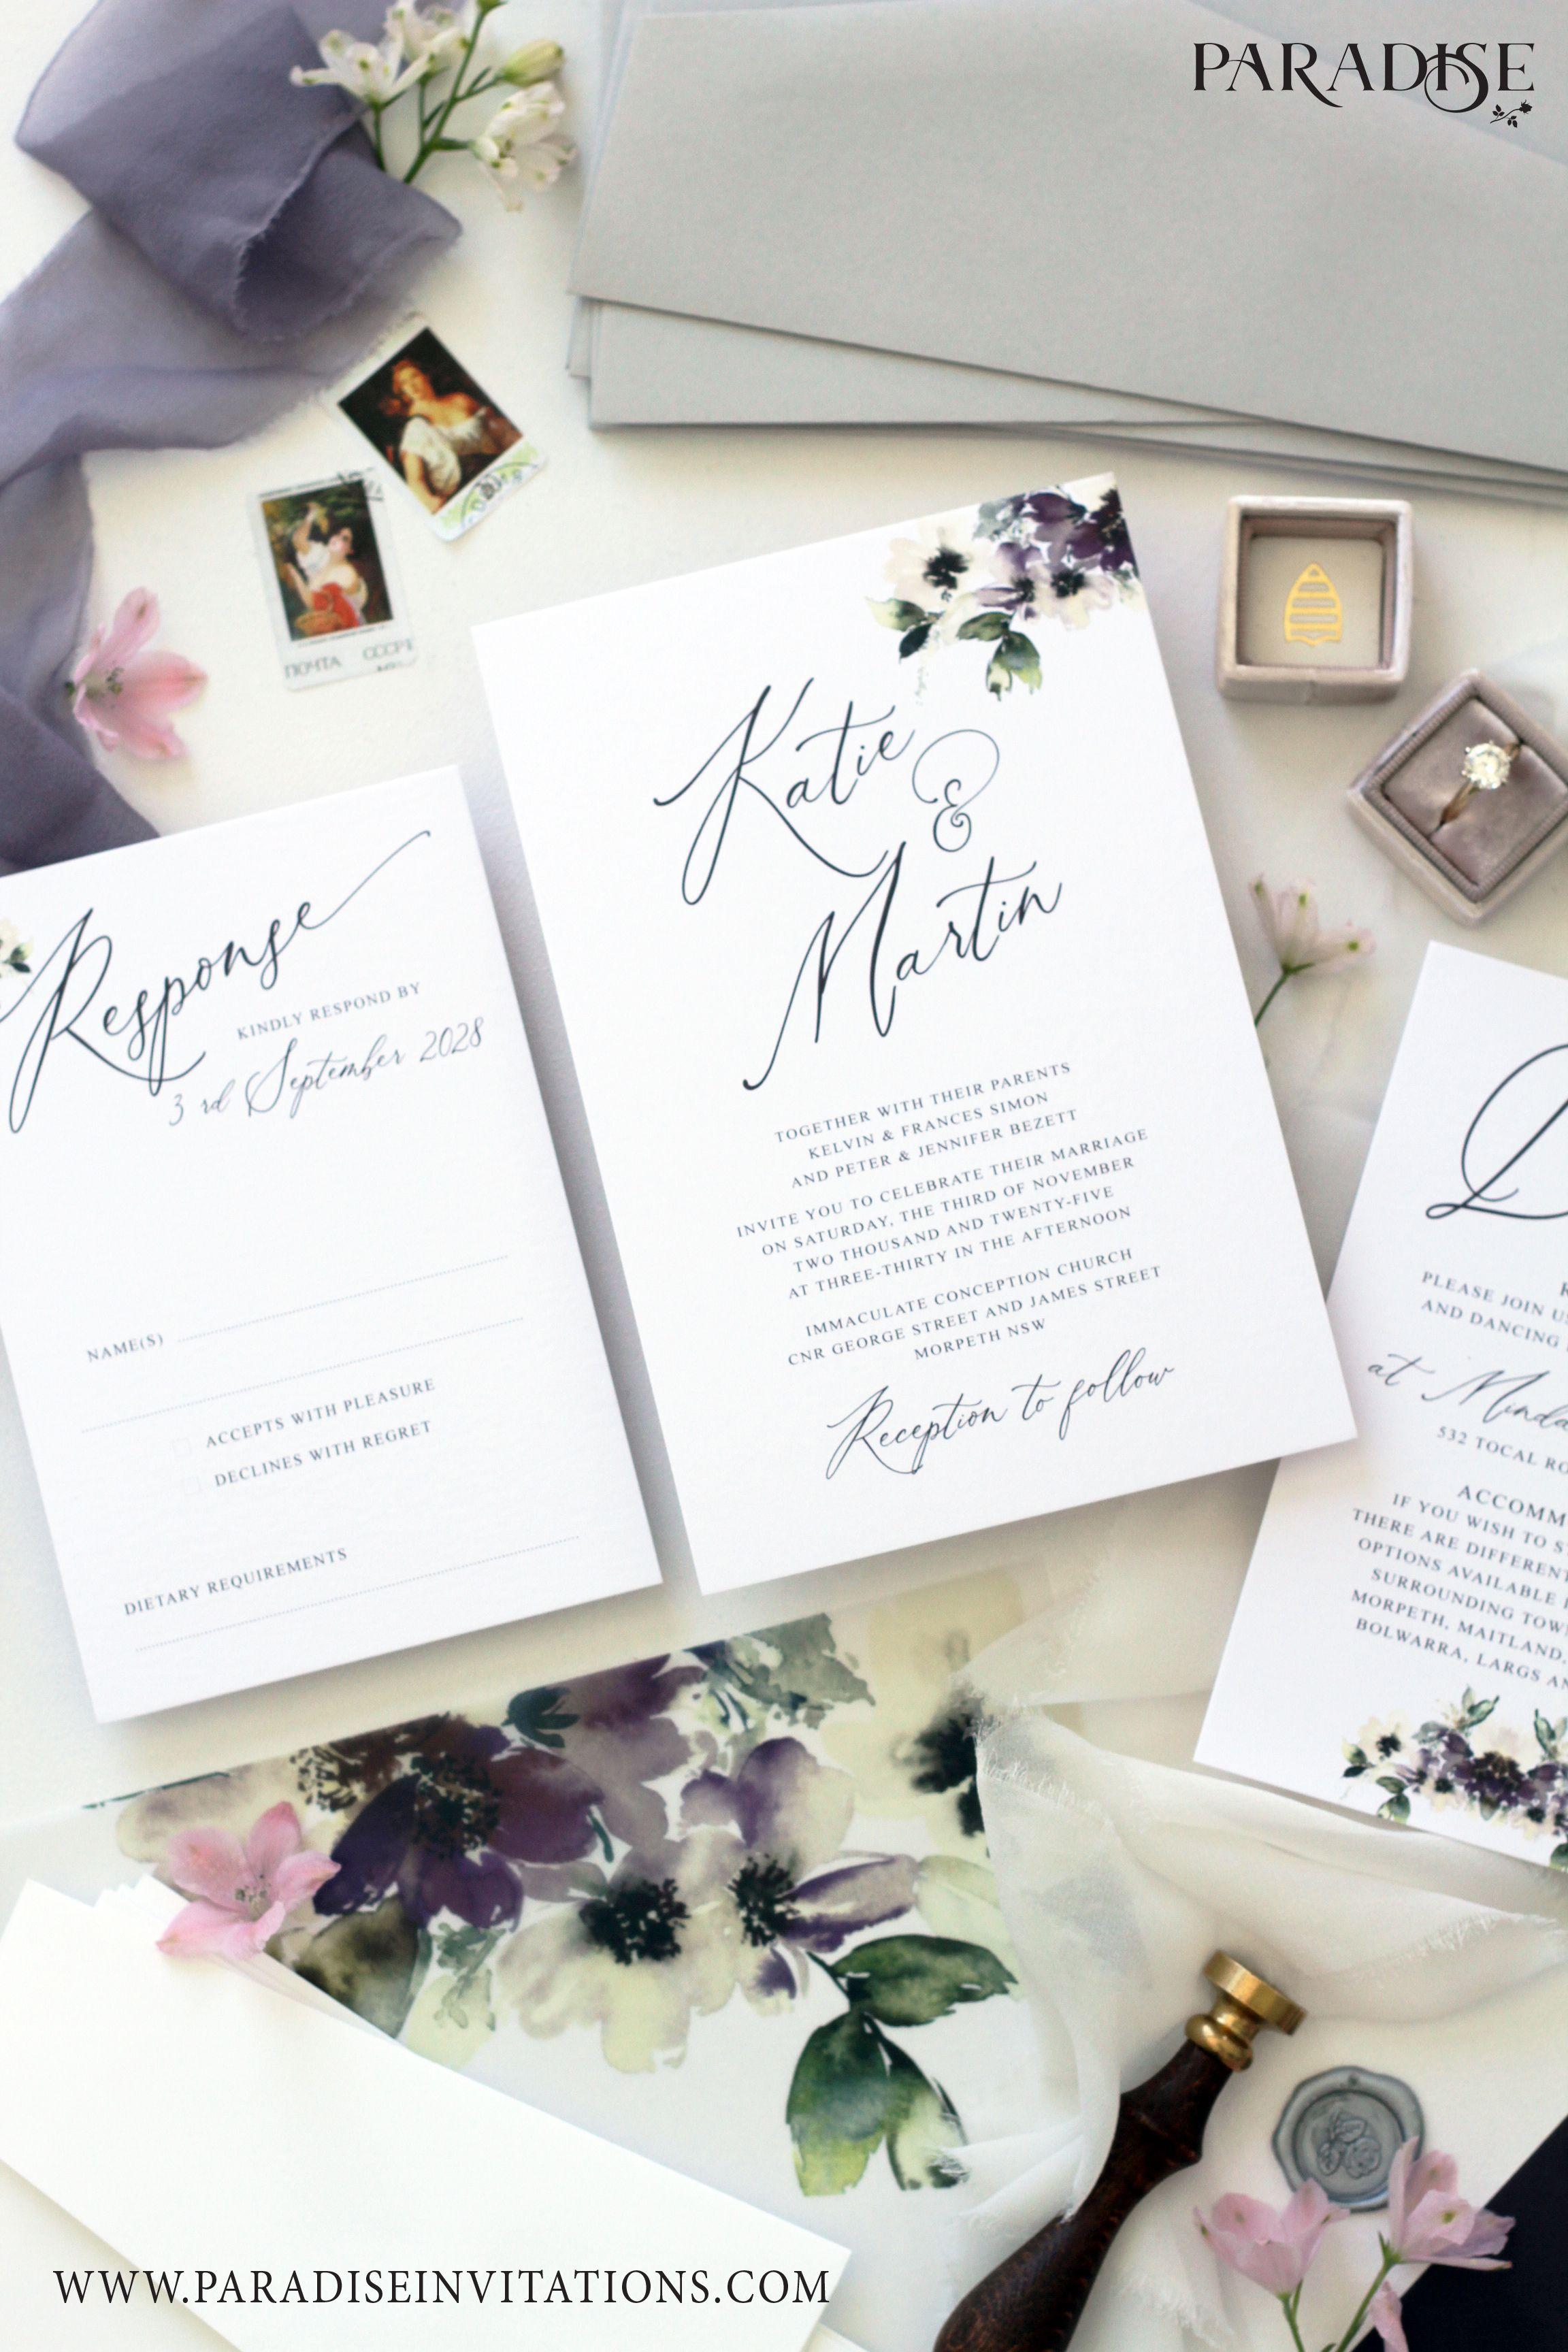 Watercolor Floral Wedding Invitation Wedding Invitation Weddinginvitation Wedd Classy Wedding Invitations Floral Wedding Stationery Fun Wedding Invitations